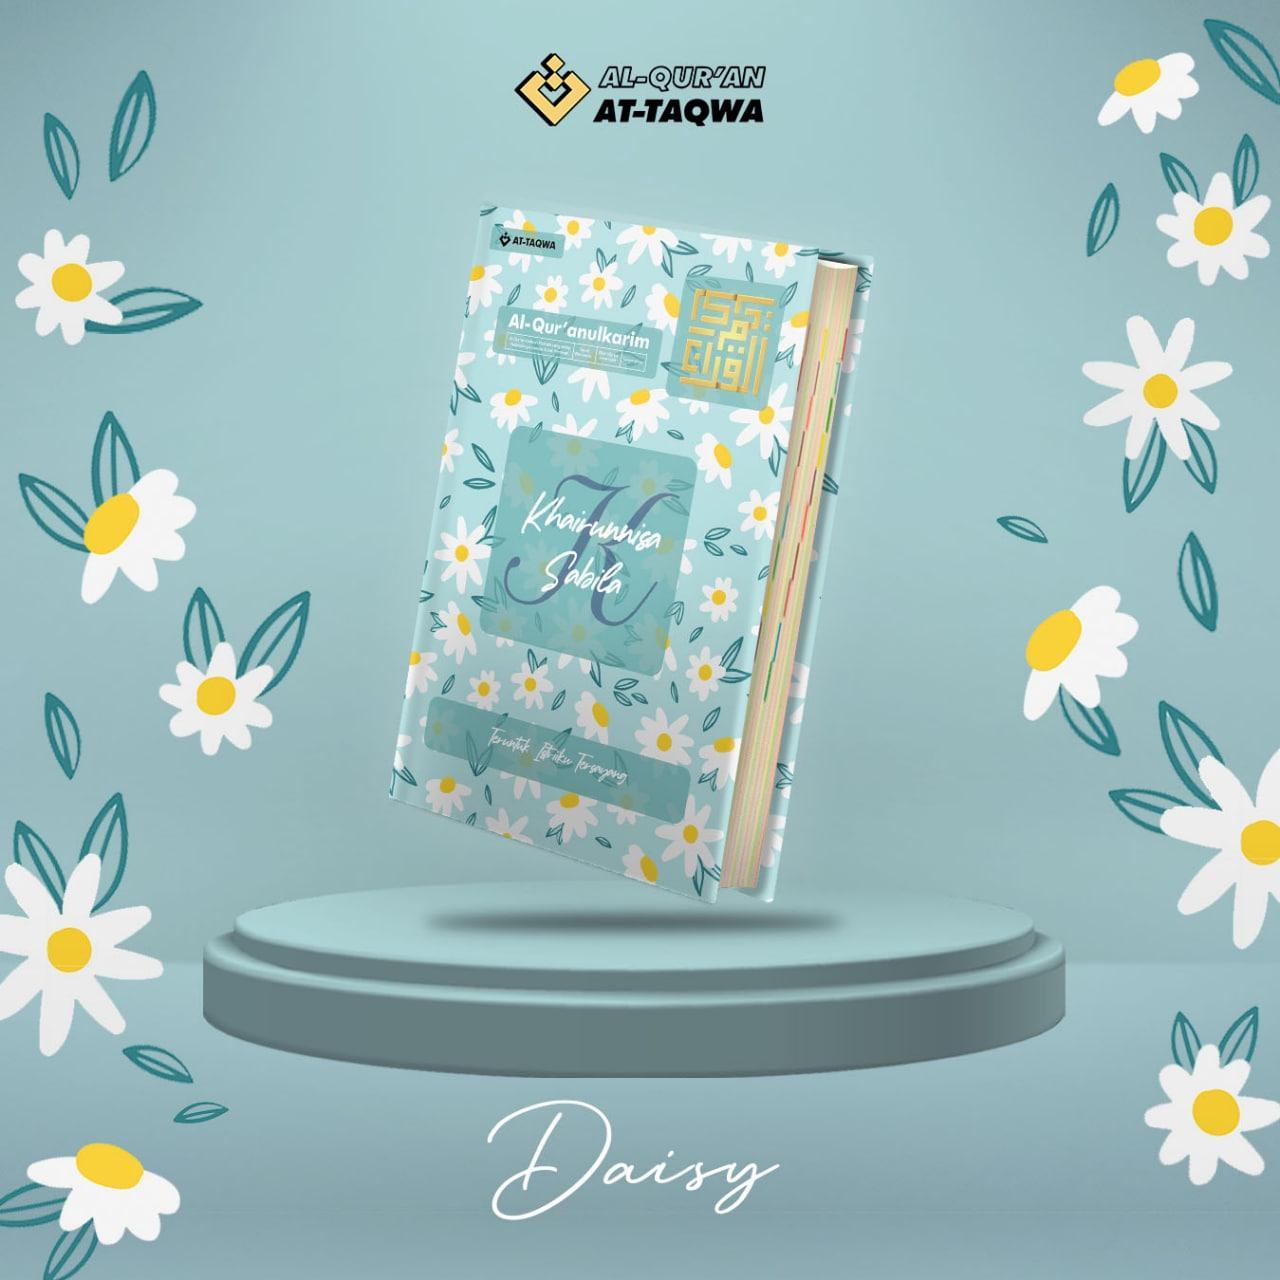 Al Quran Floral At Taqwa Daisy